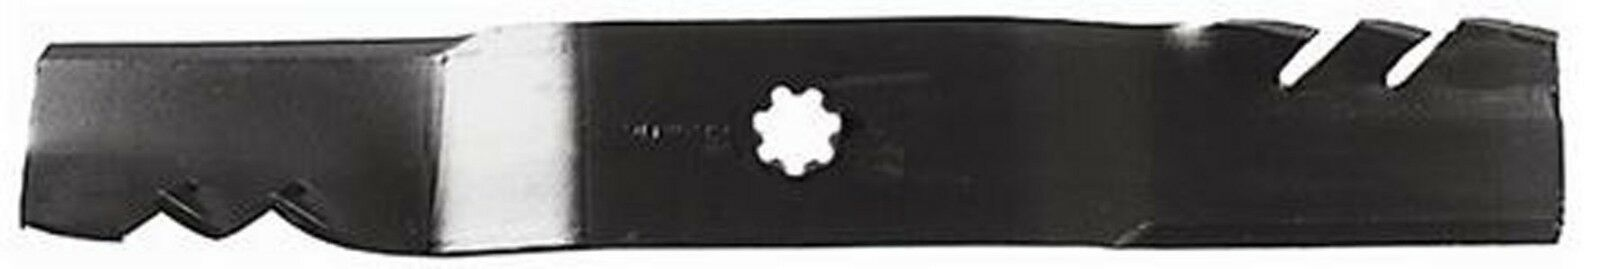 Juego de 3 Hoja Gator desbrozadora oregon para 54  190C John Deere GX21380 LA175 D170 +